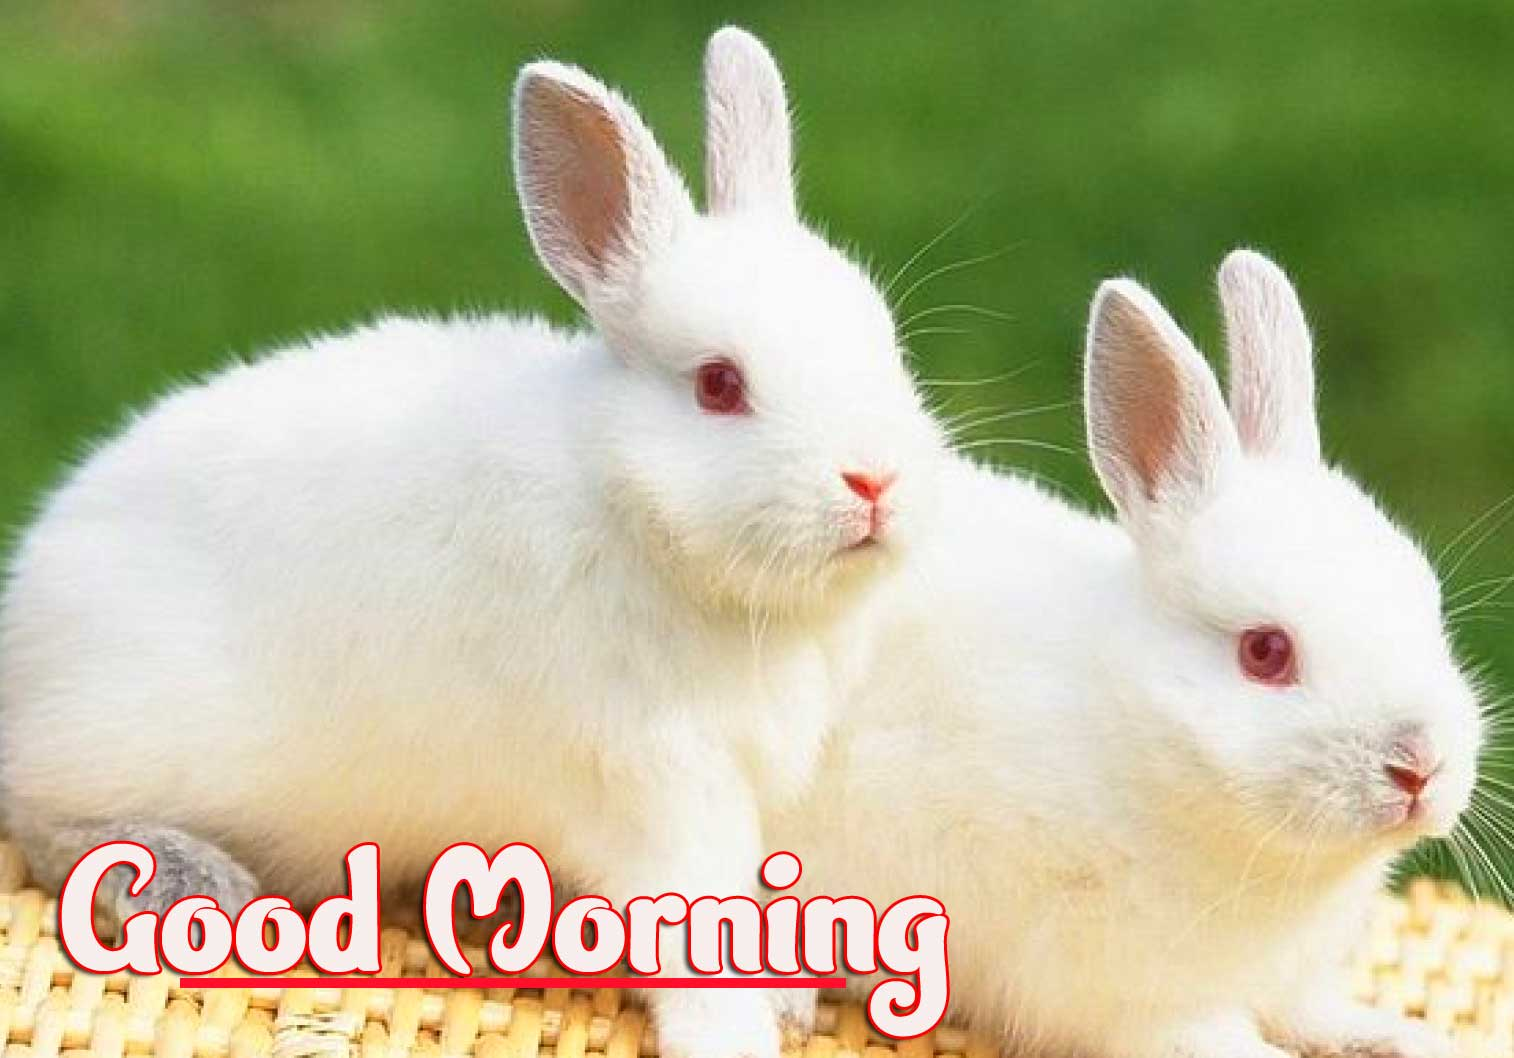 Animal Bird Lion Good Morning Wishes Pics Wallpaper for Whatsapp